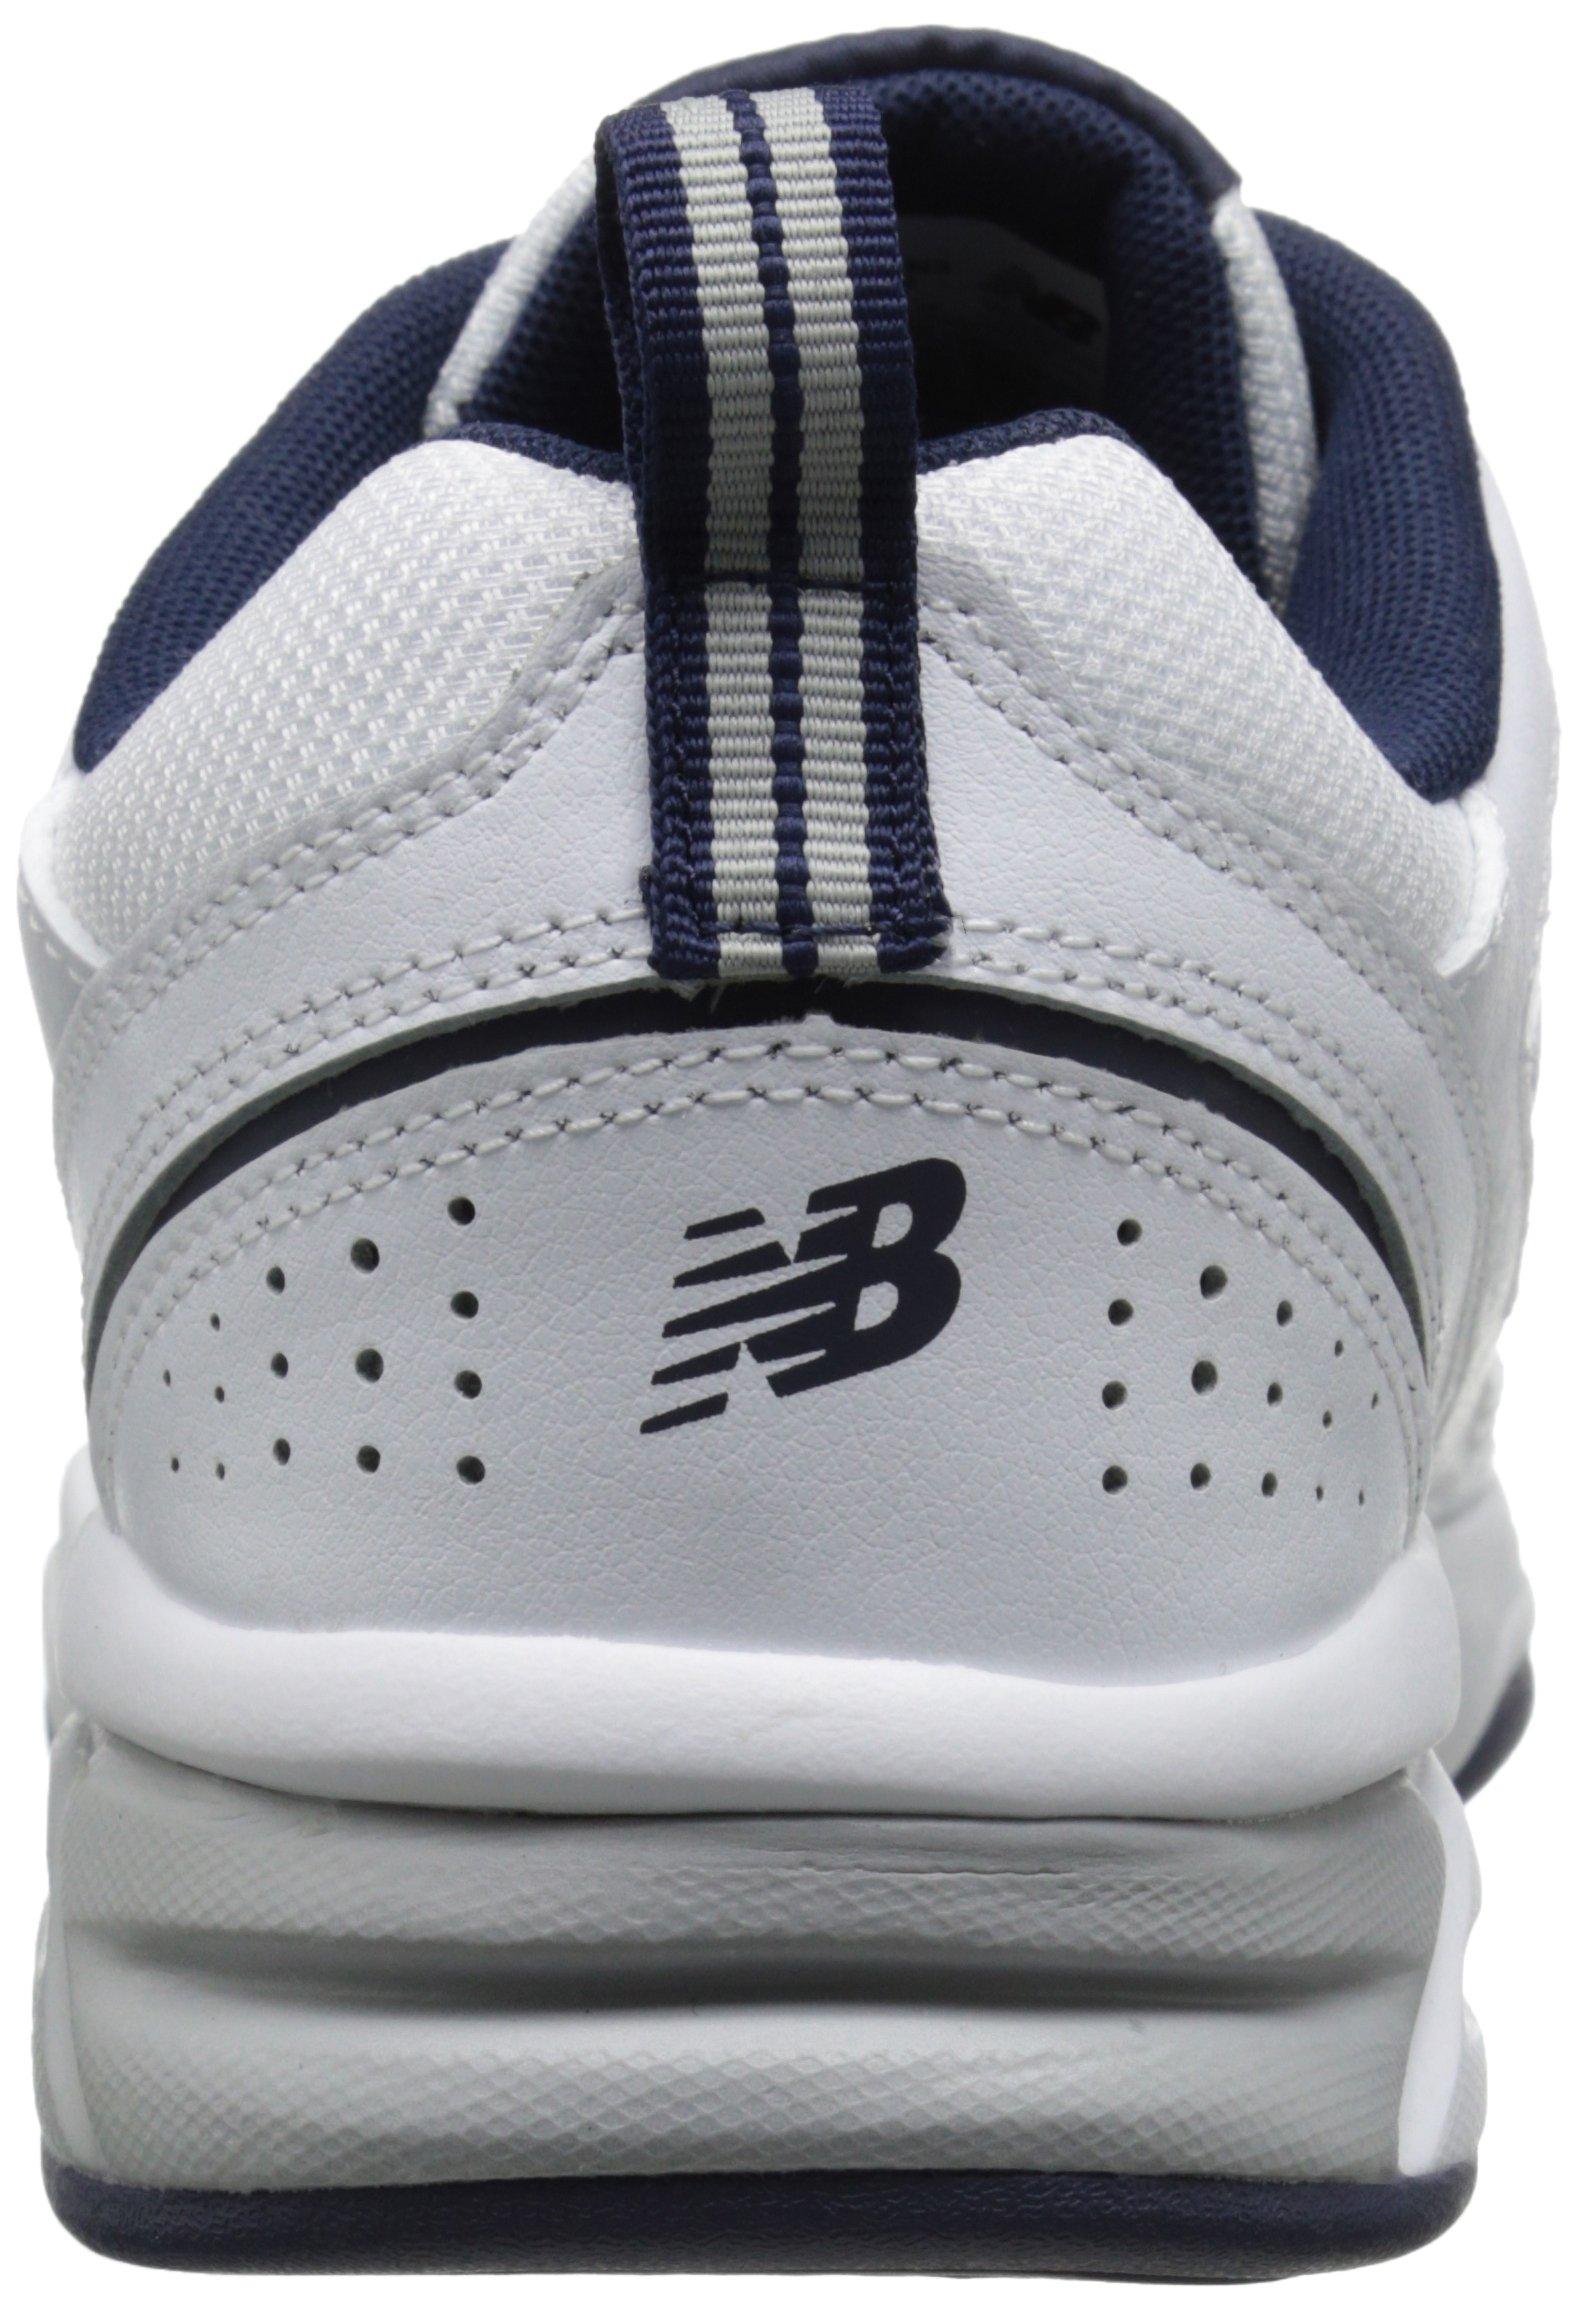 New Balance Men's MX623v3 Casual Comfort Training Shoe,  White/Navy, 8 M US by New Balance (Image #2)